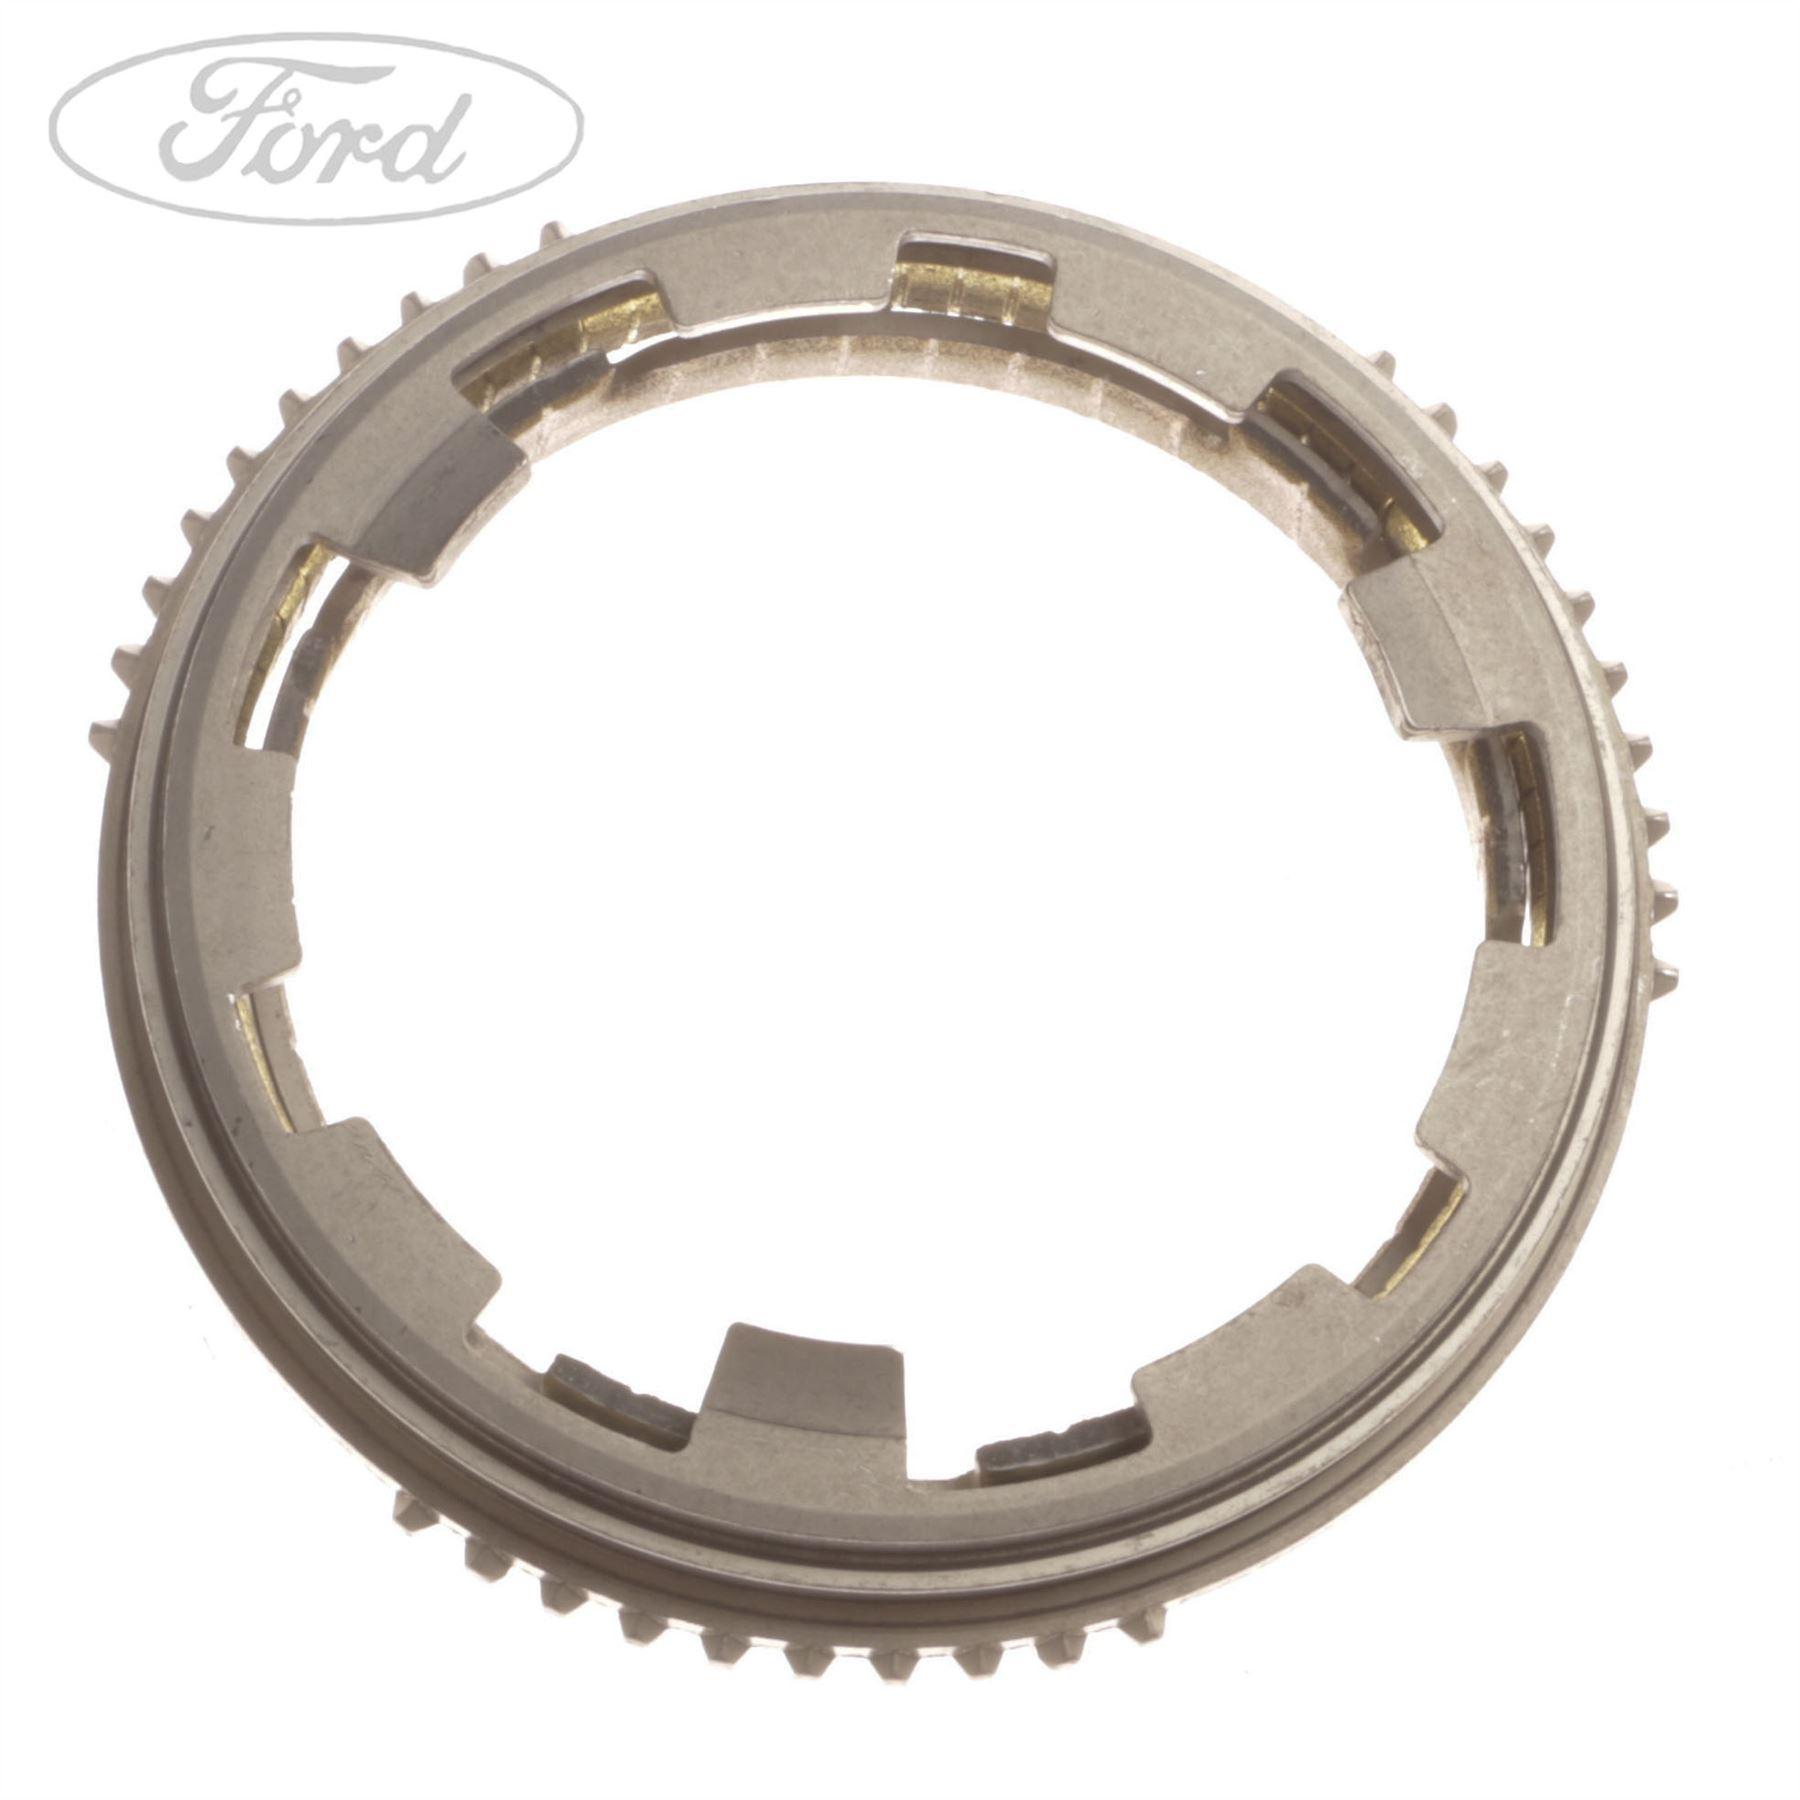 Ford Focus 1.6 TDCi CB6 Synchro Ring Genuine OE Ford